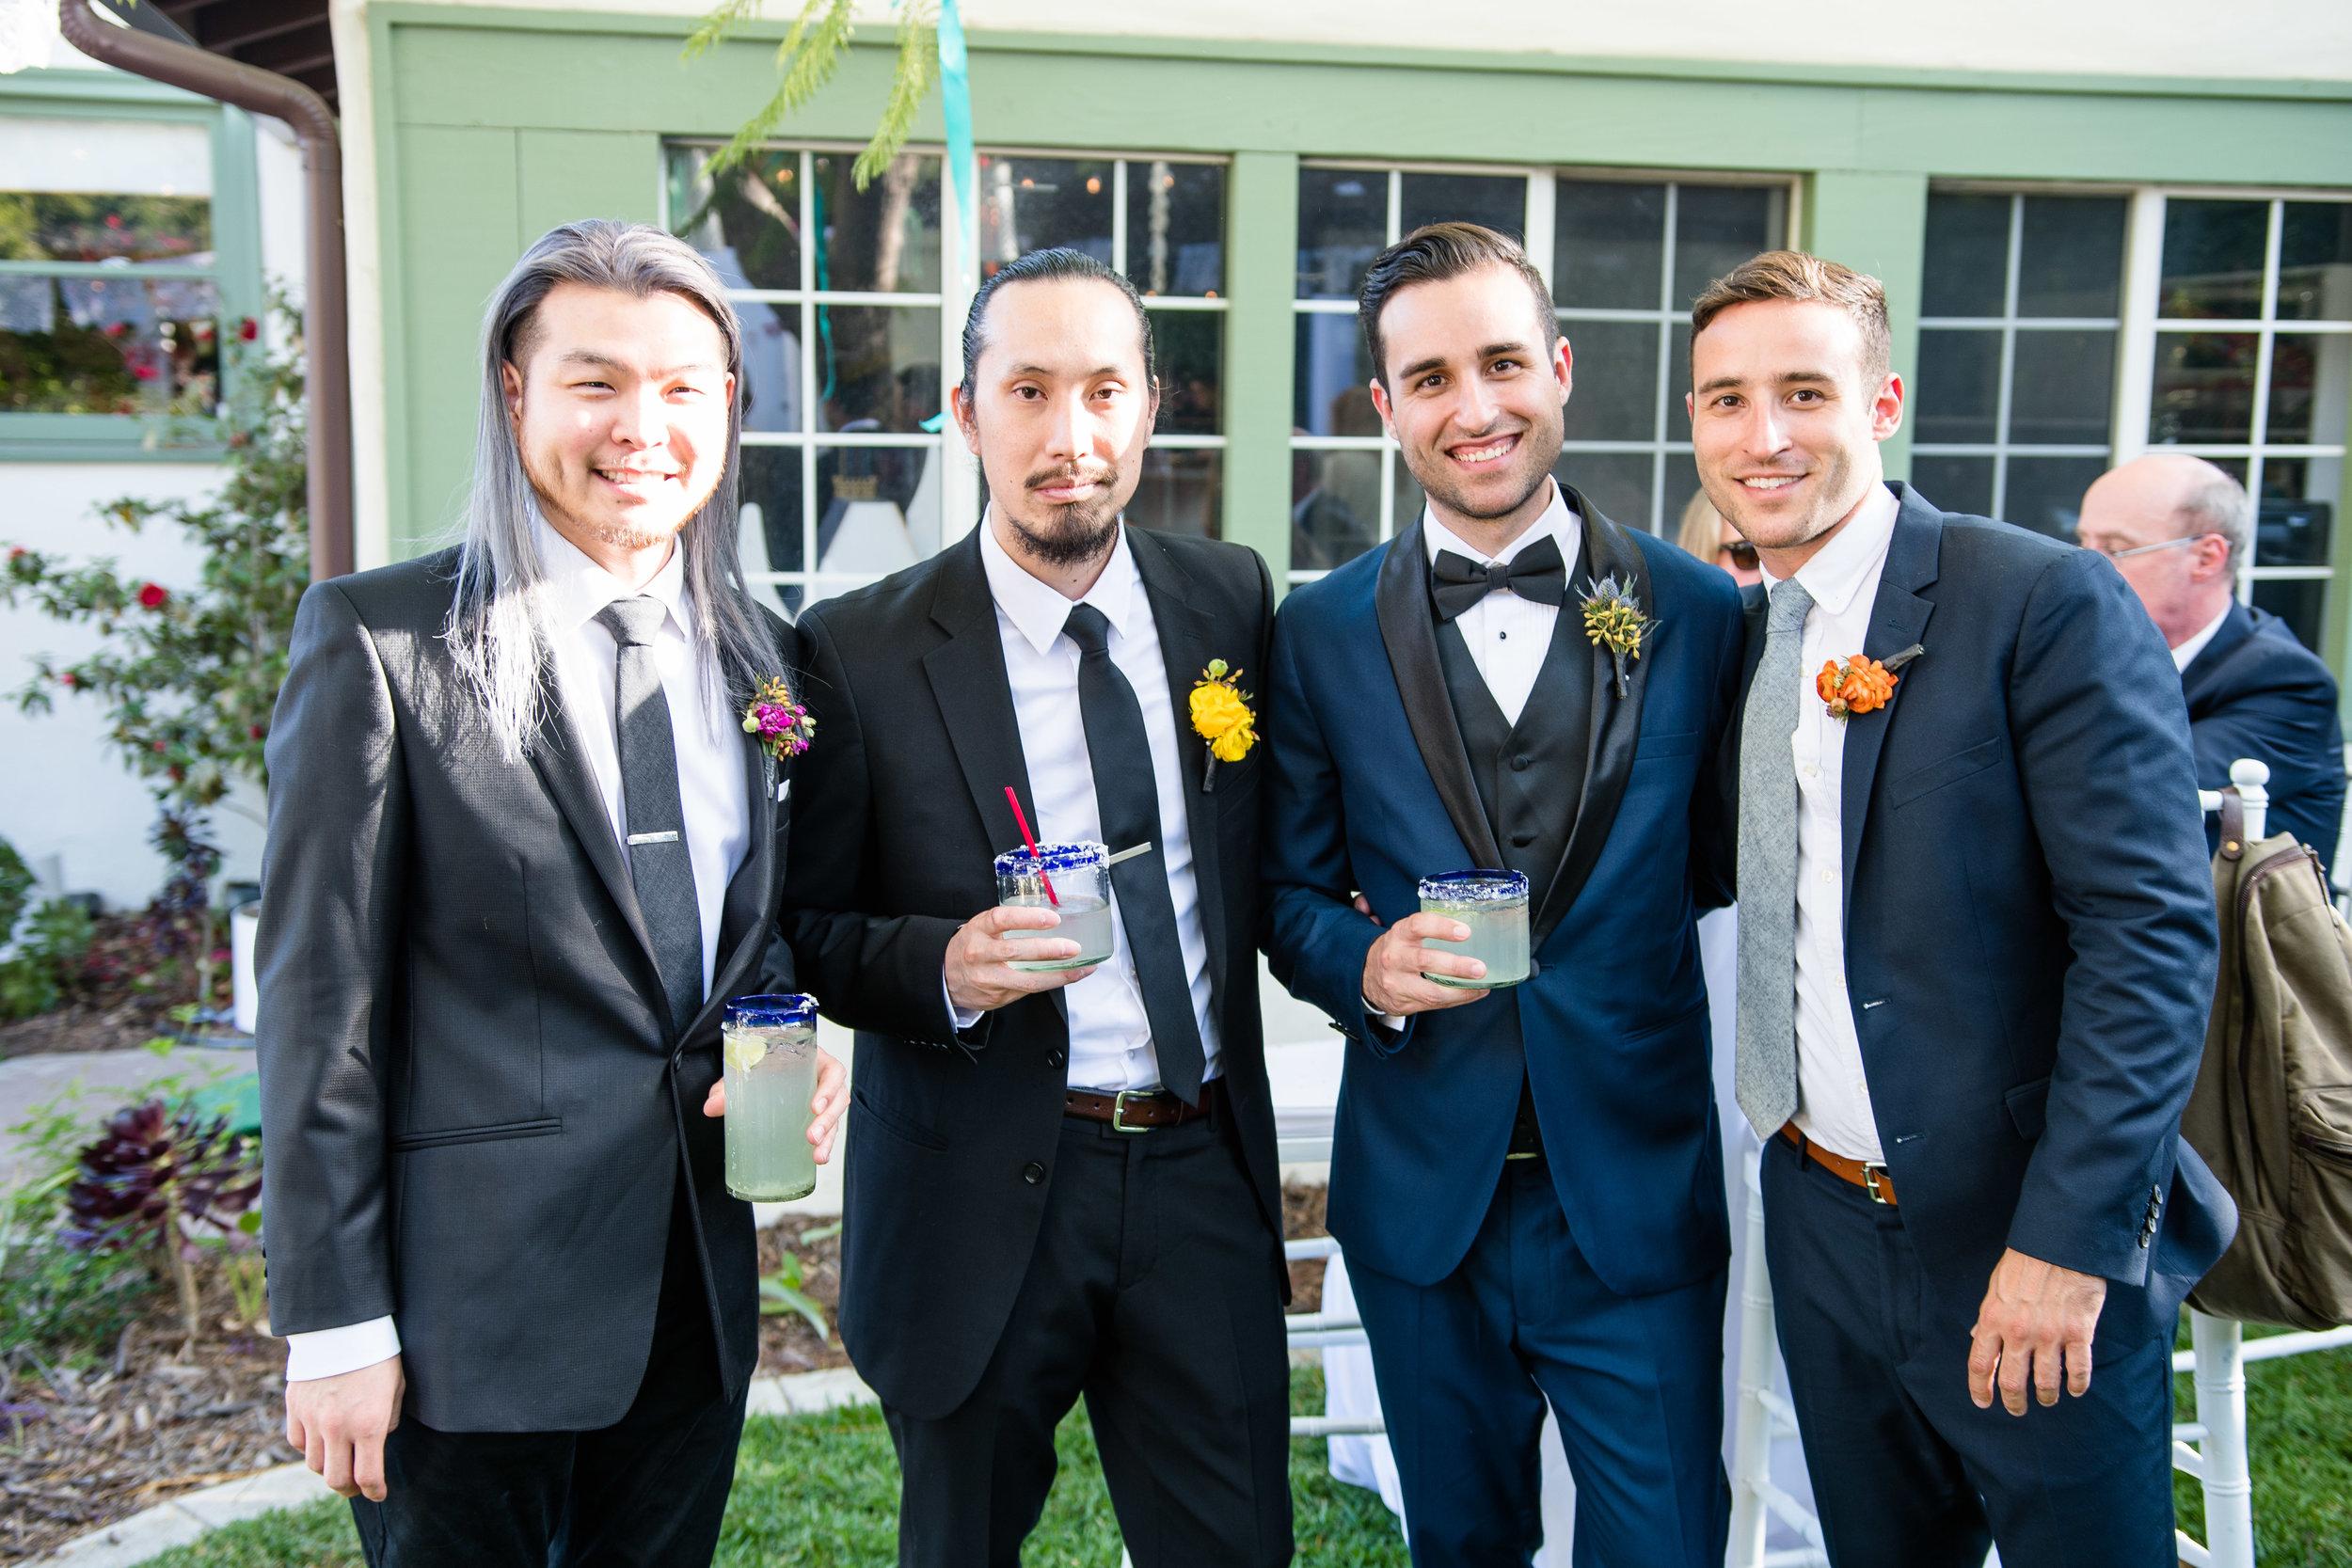 Vibrant Fiesta Backyard Wedding Reception groom and groomsmen.jpg